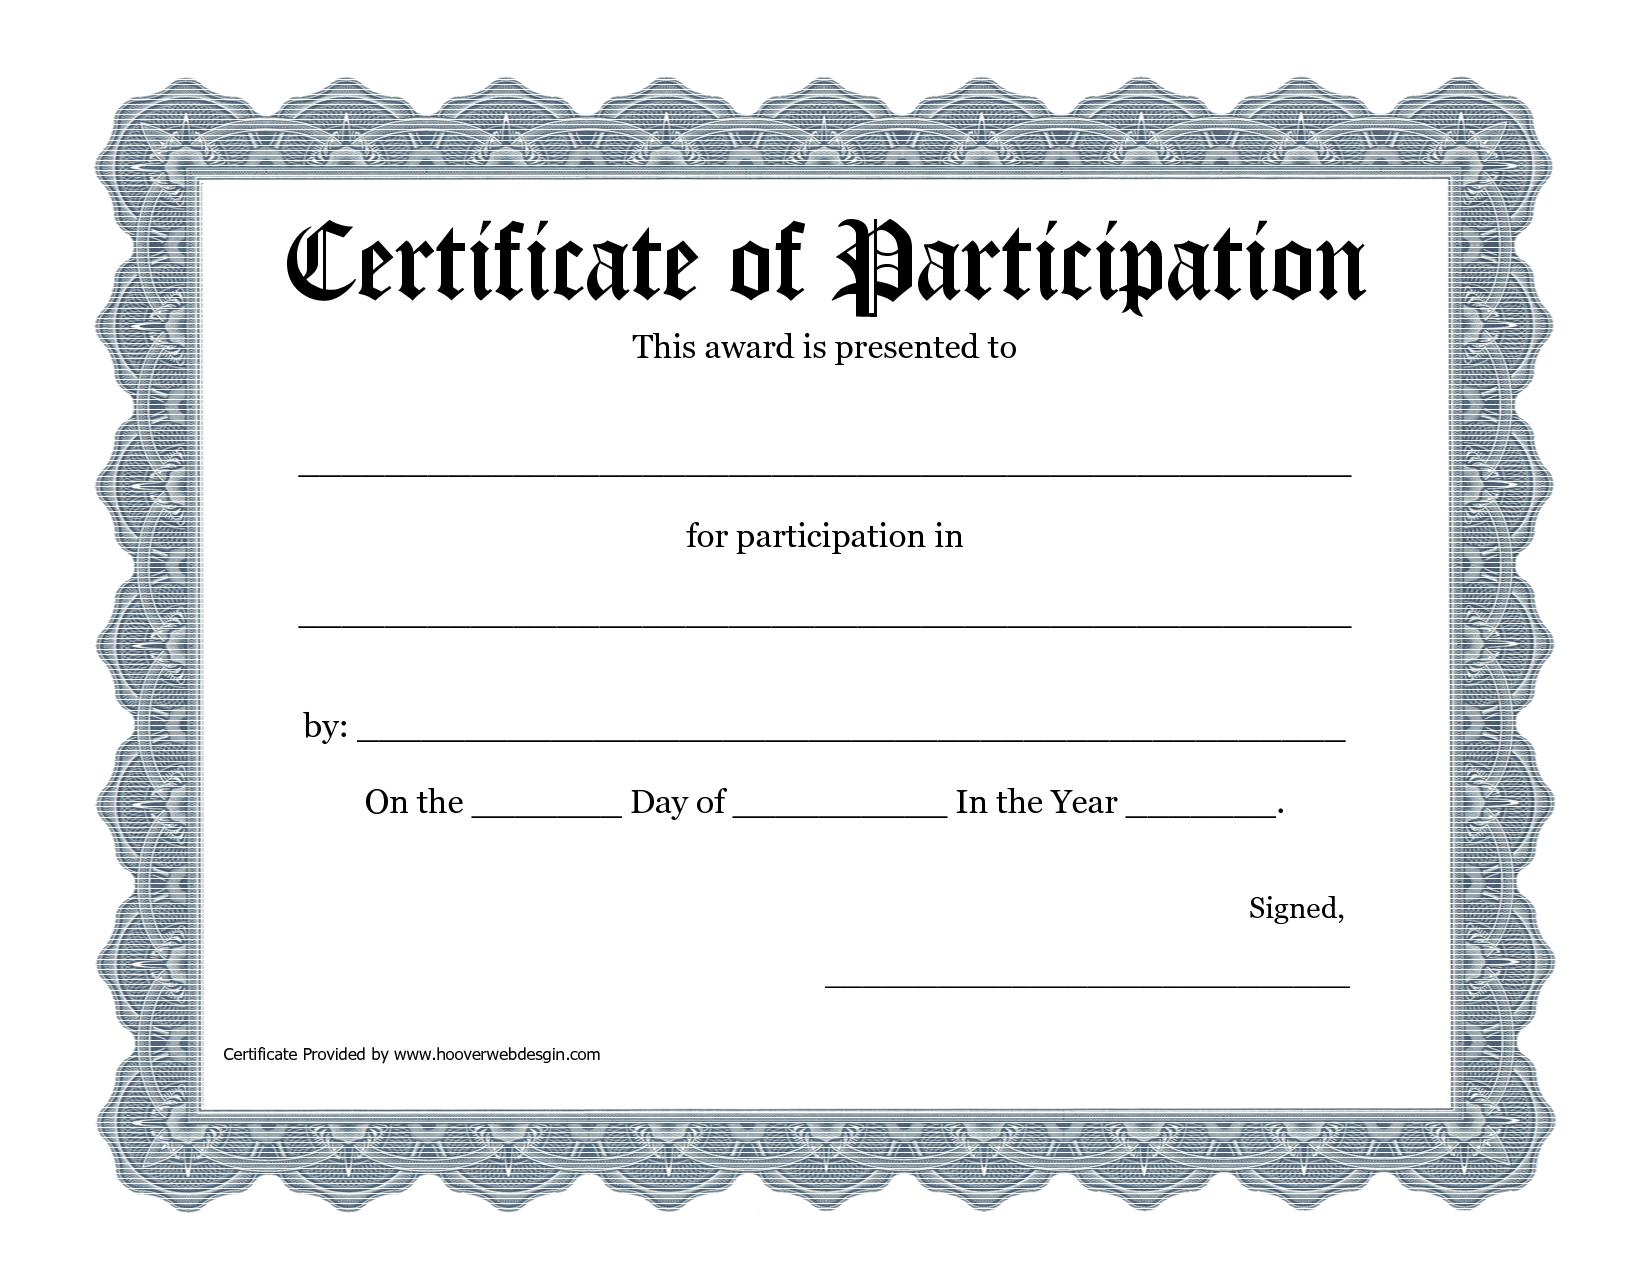 Free Printable Award Certificate Template - Bing Images   2016 Art - Free Printable Award Certificates